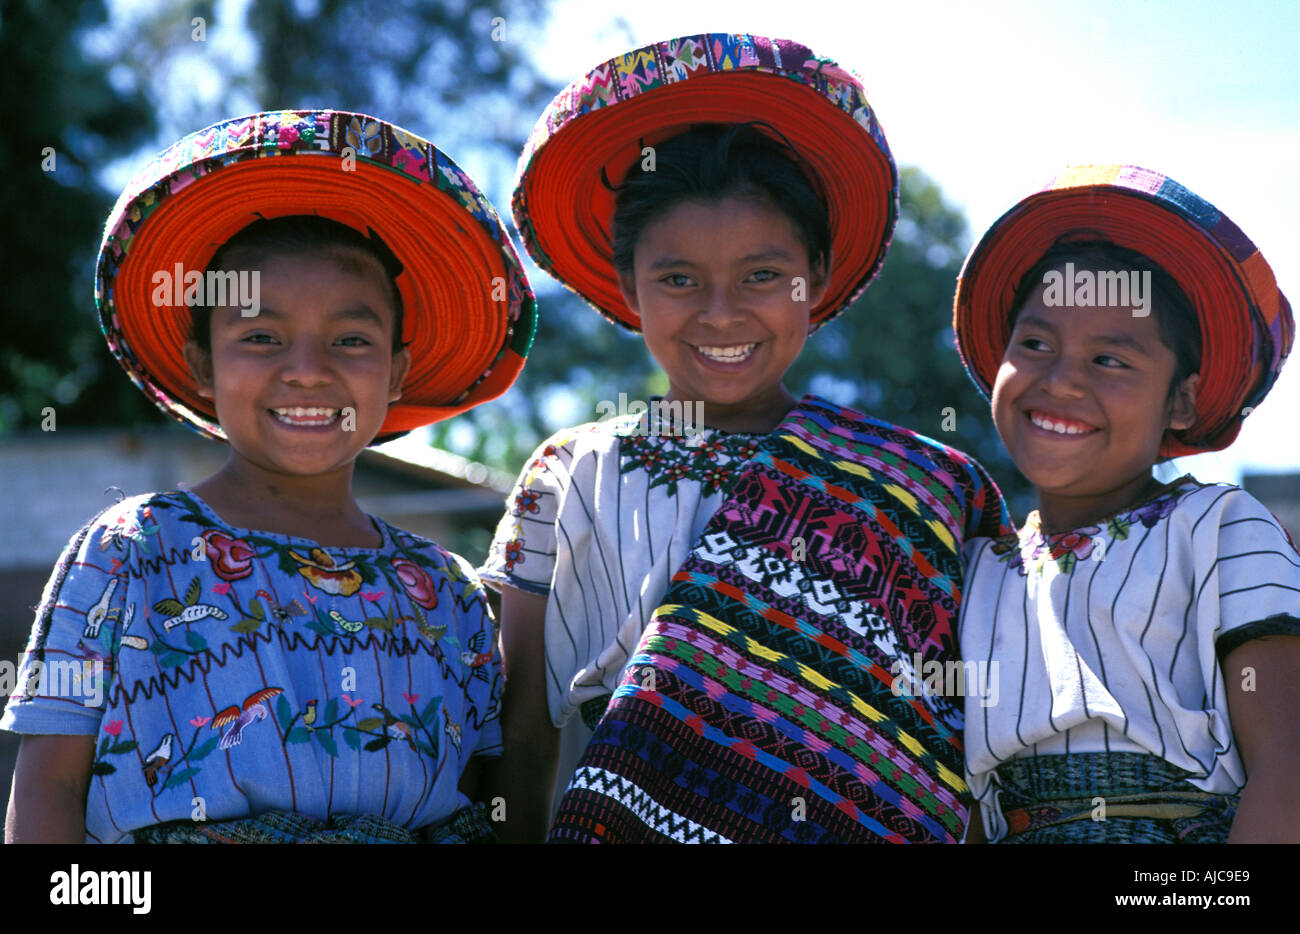 3 young girls in the distinctive tribal costume of their Tzutihil Maya community Santiago Atitlan Guatemala - Stock Image